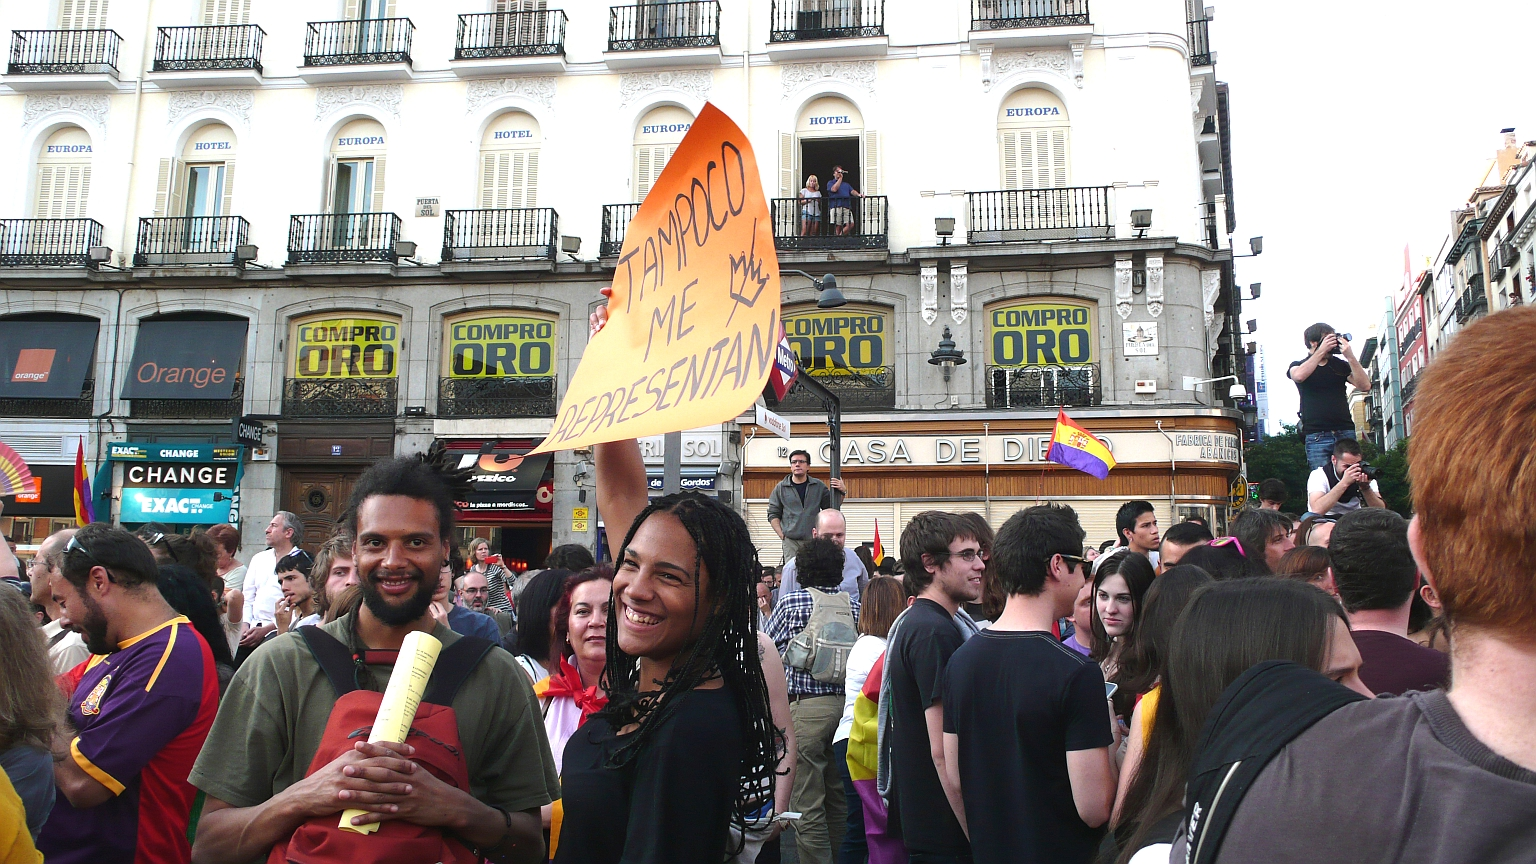 Puerta_del_Sol_Multitude_2014_06_02_2_H